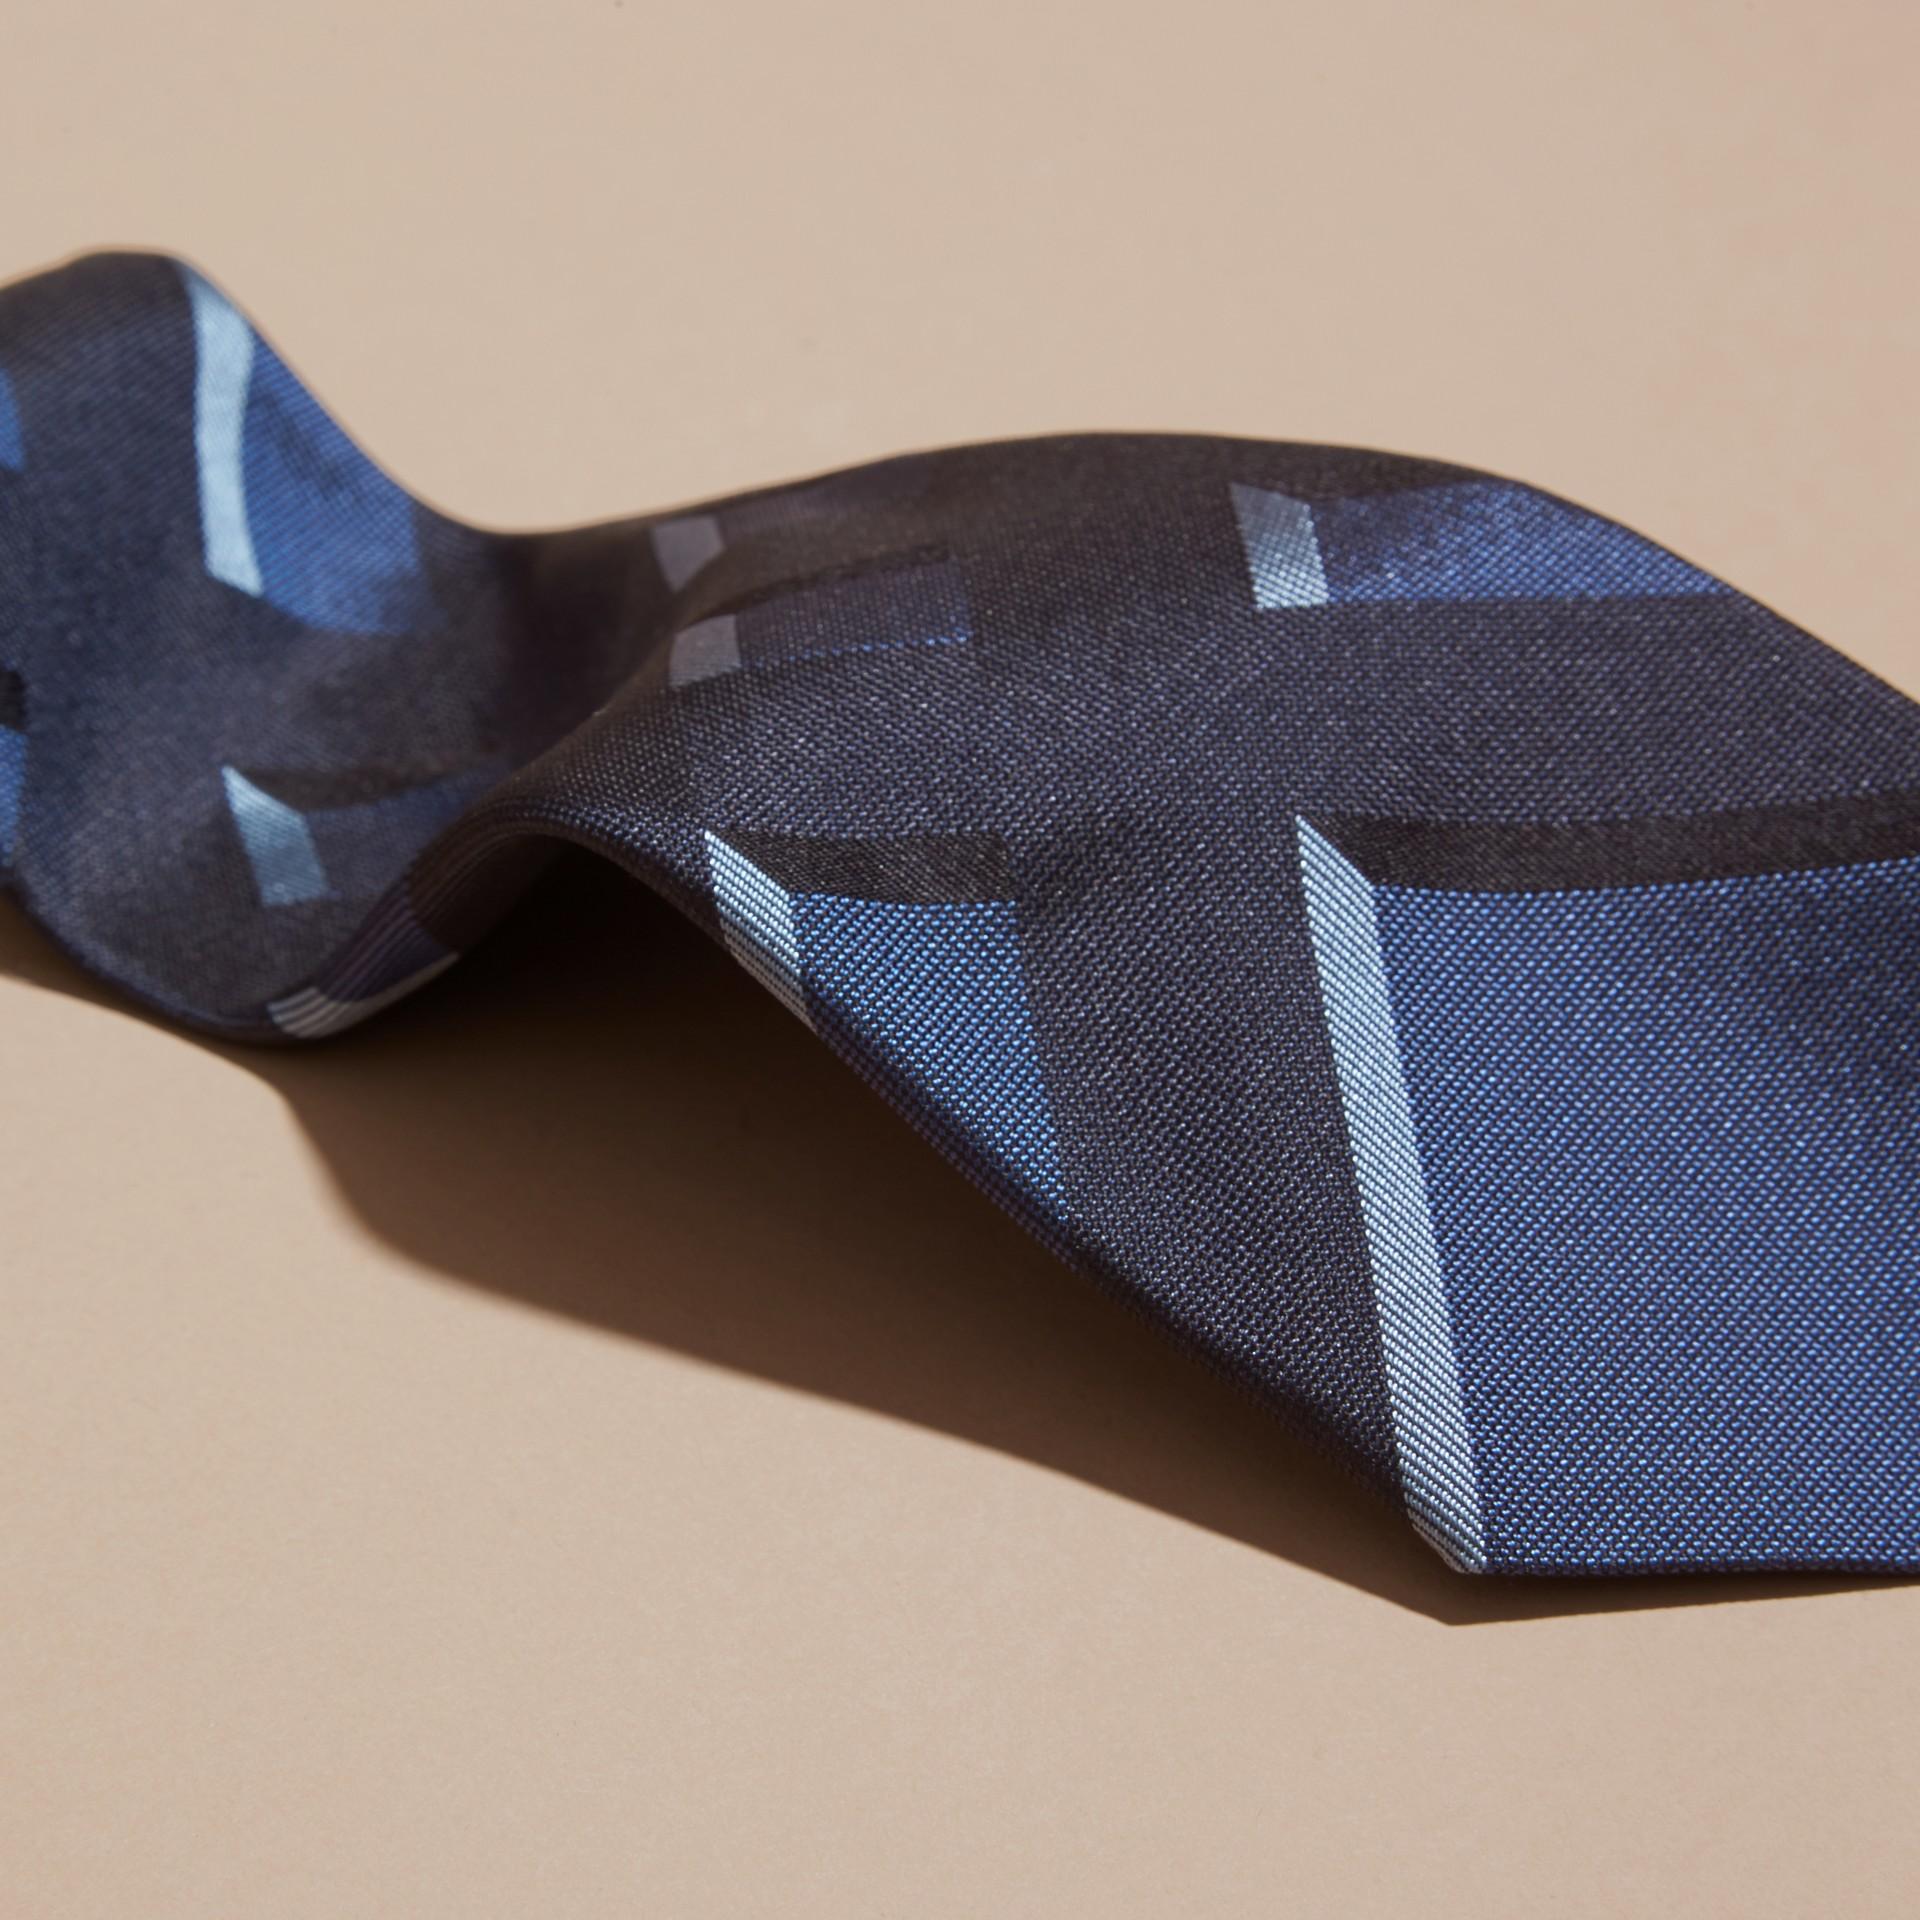 Hydrangea blue Modern Cut Check Jacquard Silk Tie Hydrangea Blue - gallery image 2